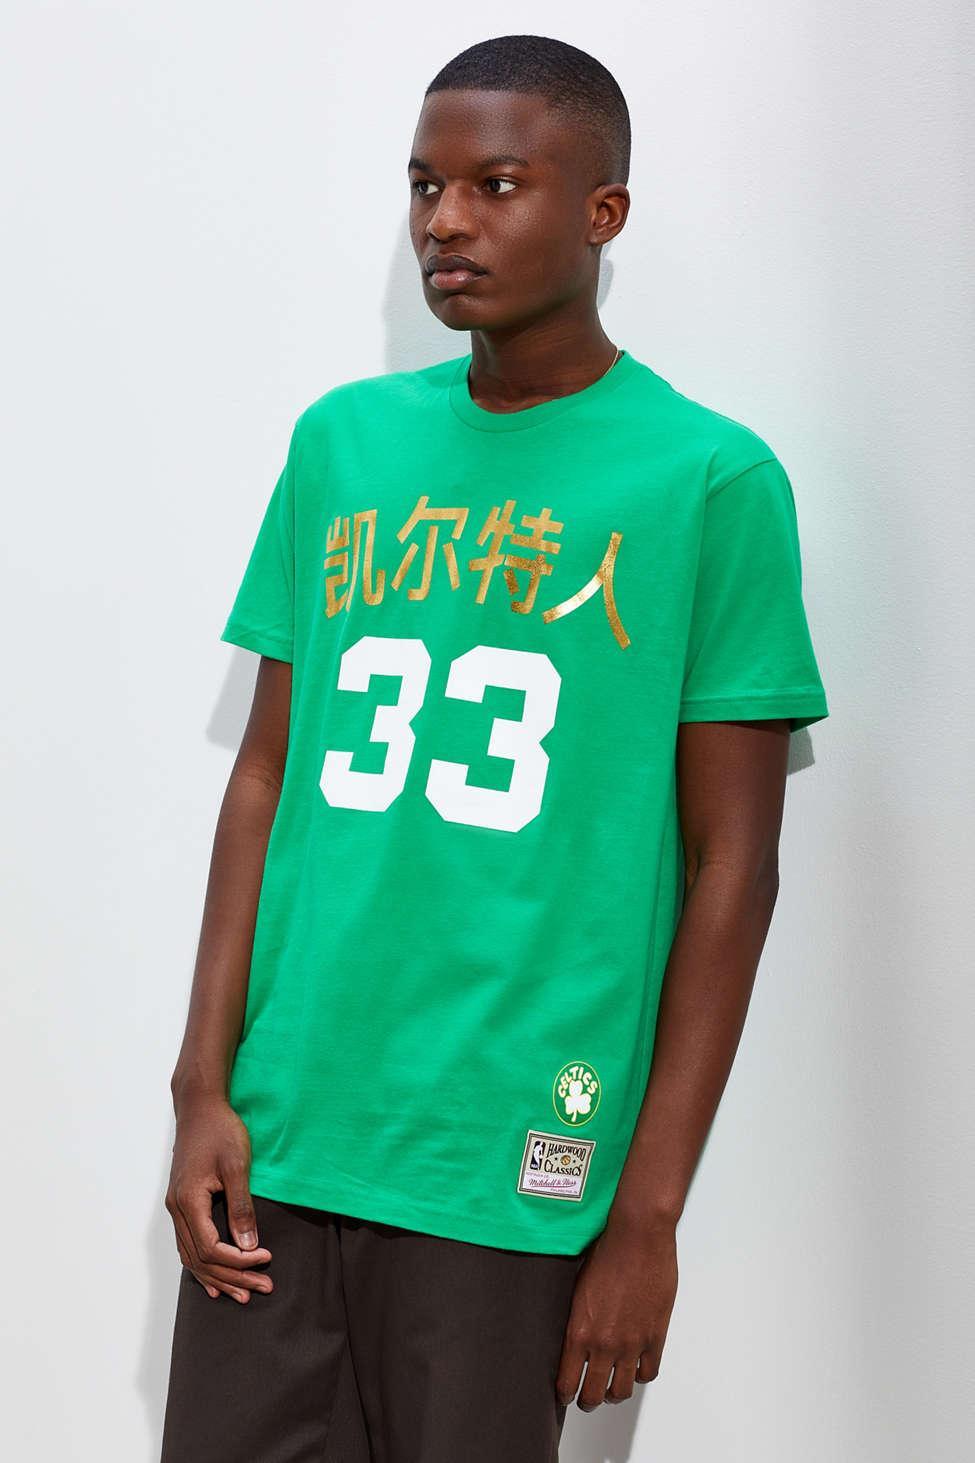 bb27427cc00 Mitchell & Ness - Green Chinese New Year Boston Celtics Larry Bird Tee for  Men -. View fullscreen